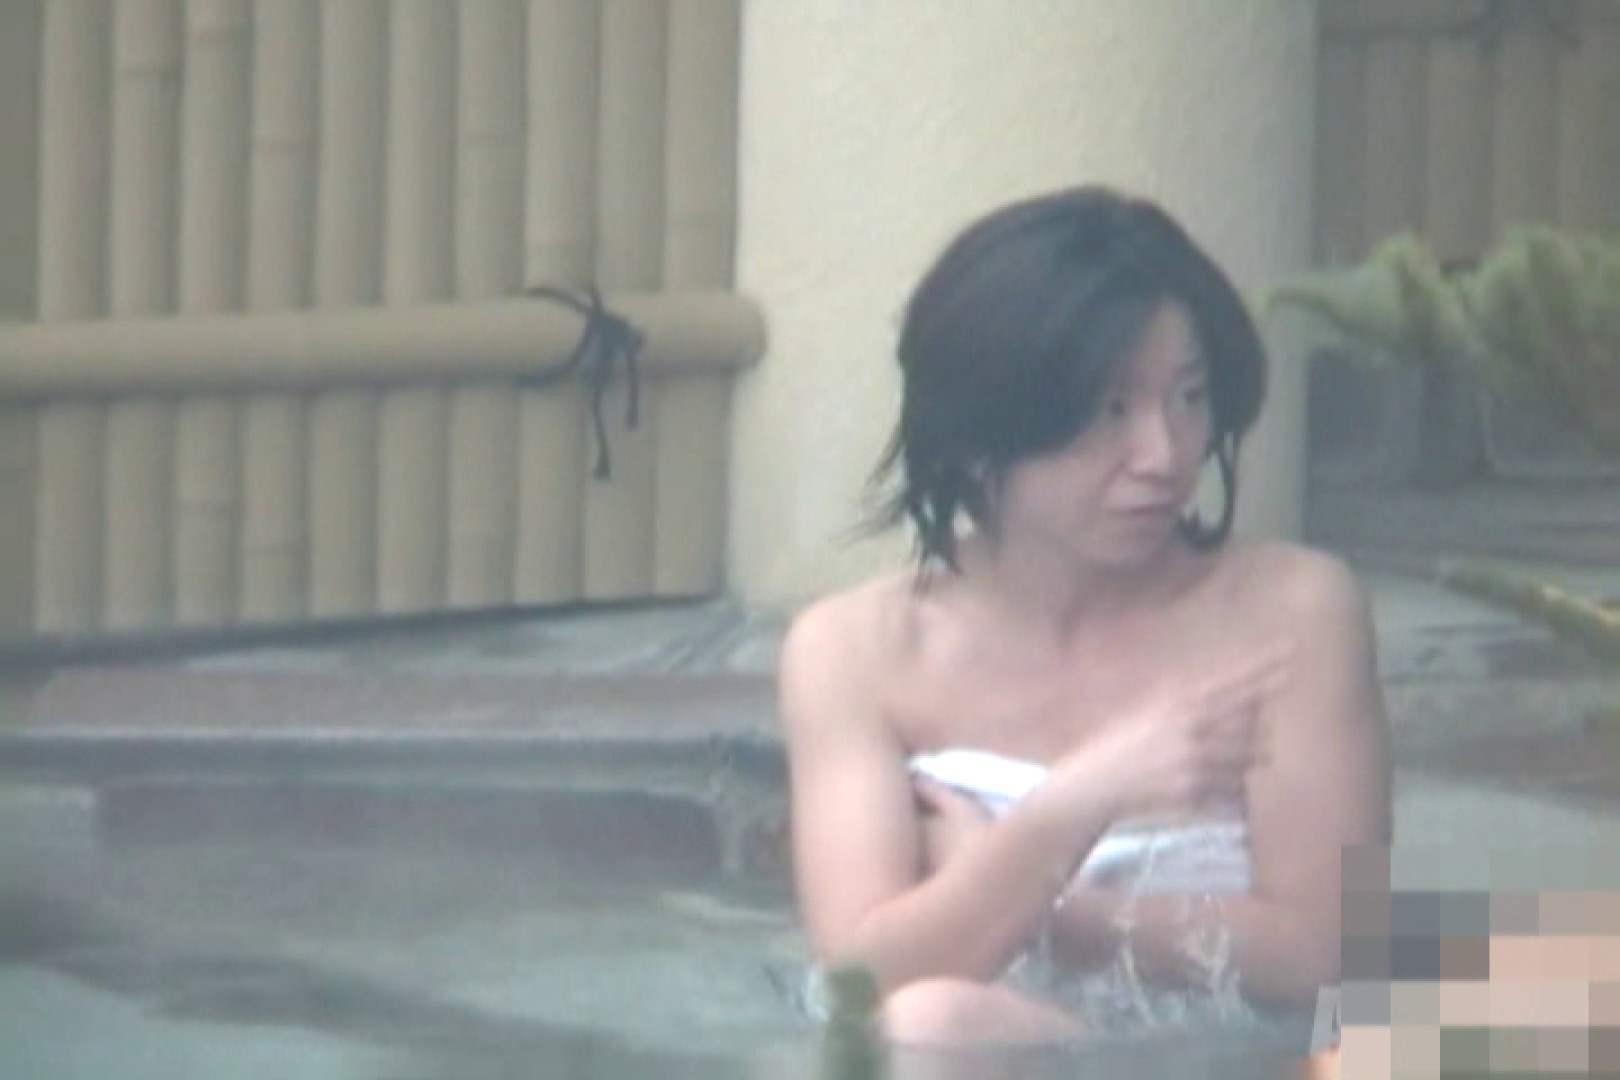 Aquaな露天風呂Vol.841 美しいOLの裸体   露天風呂突入  77pic 76